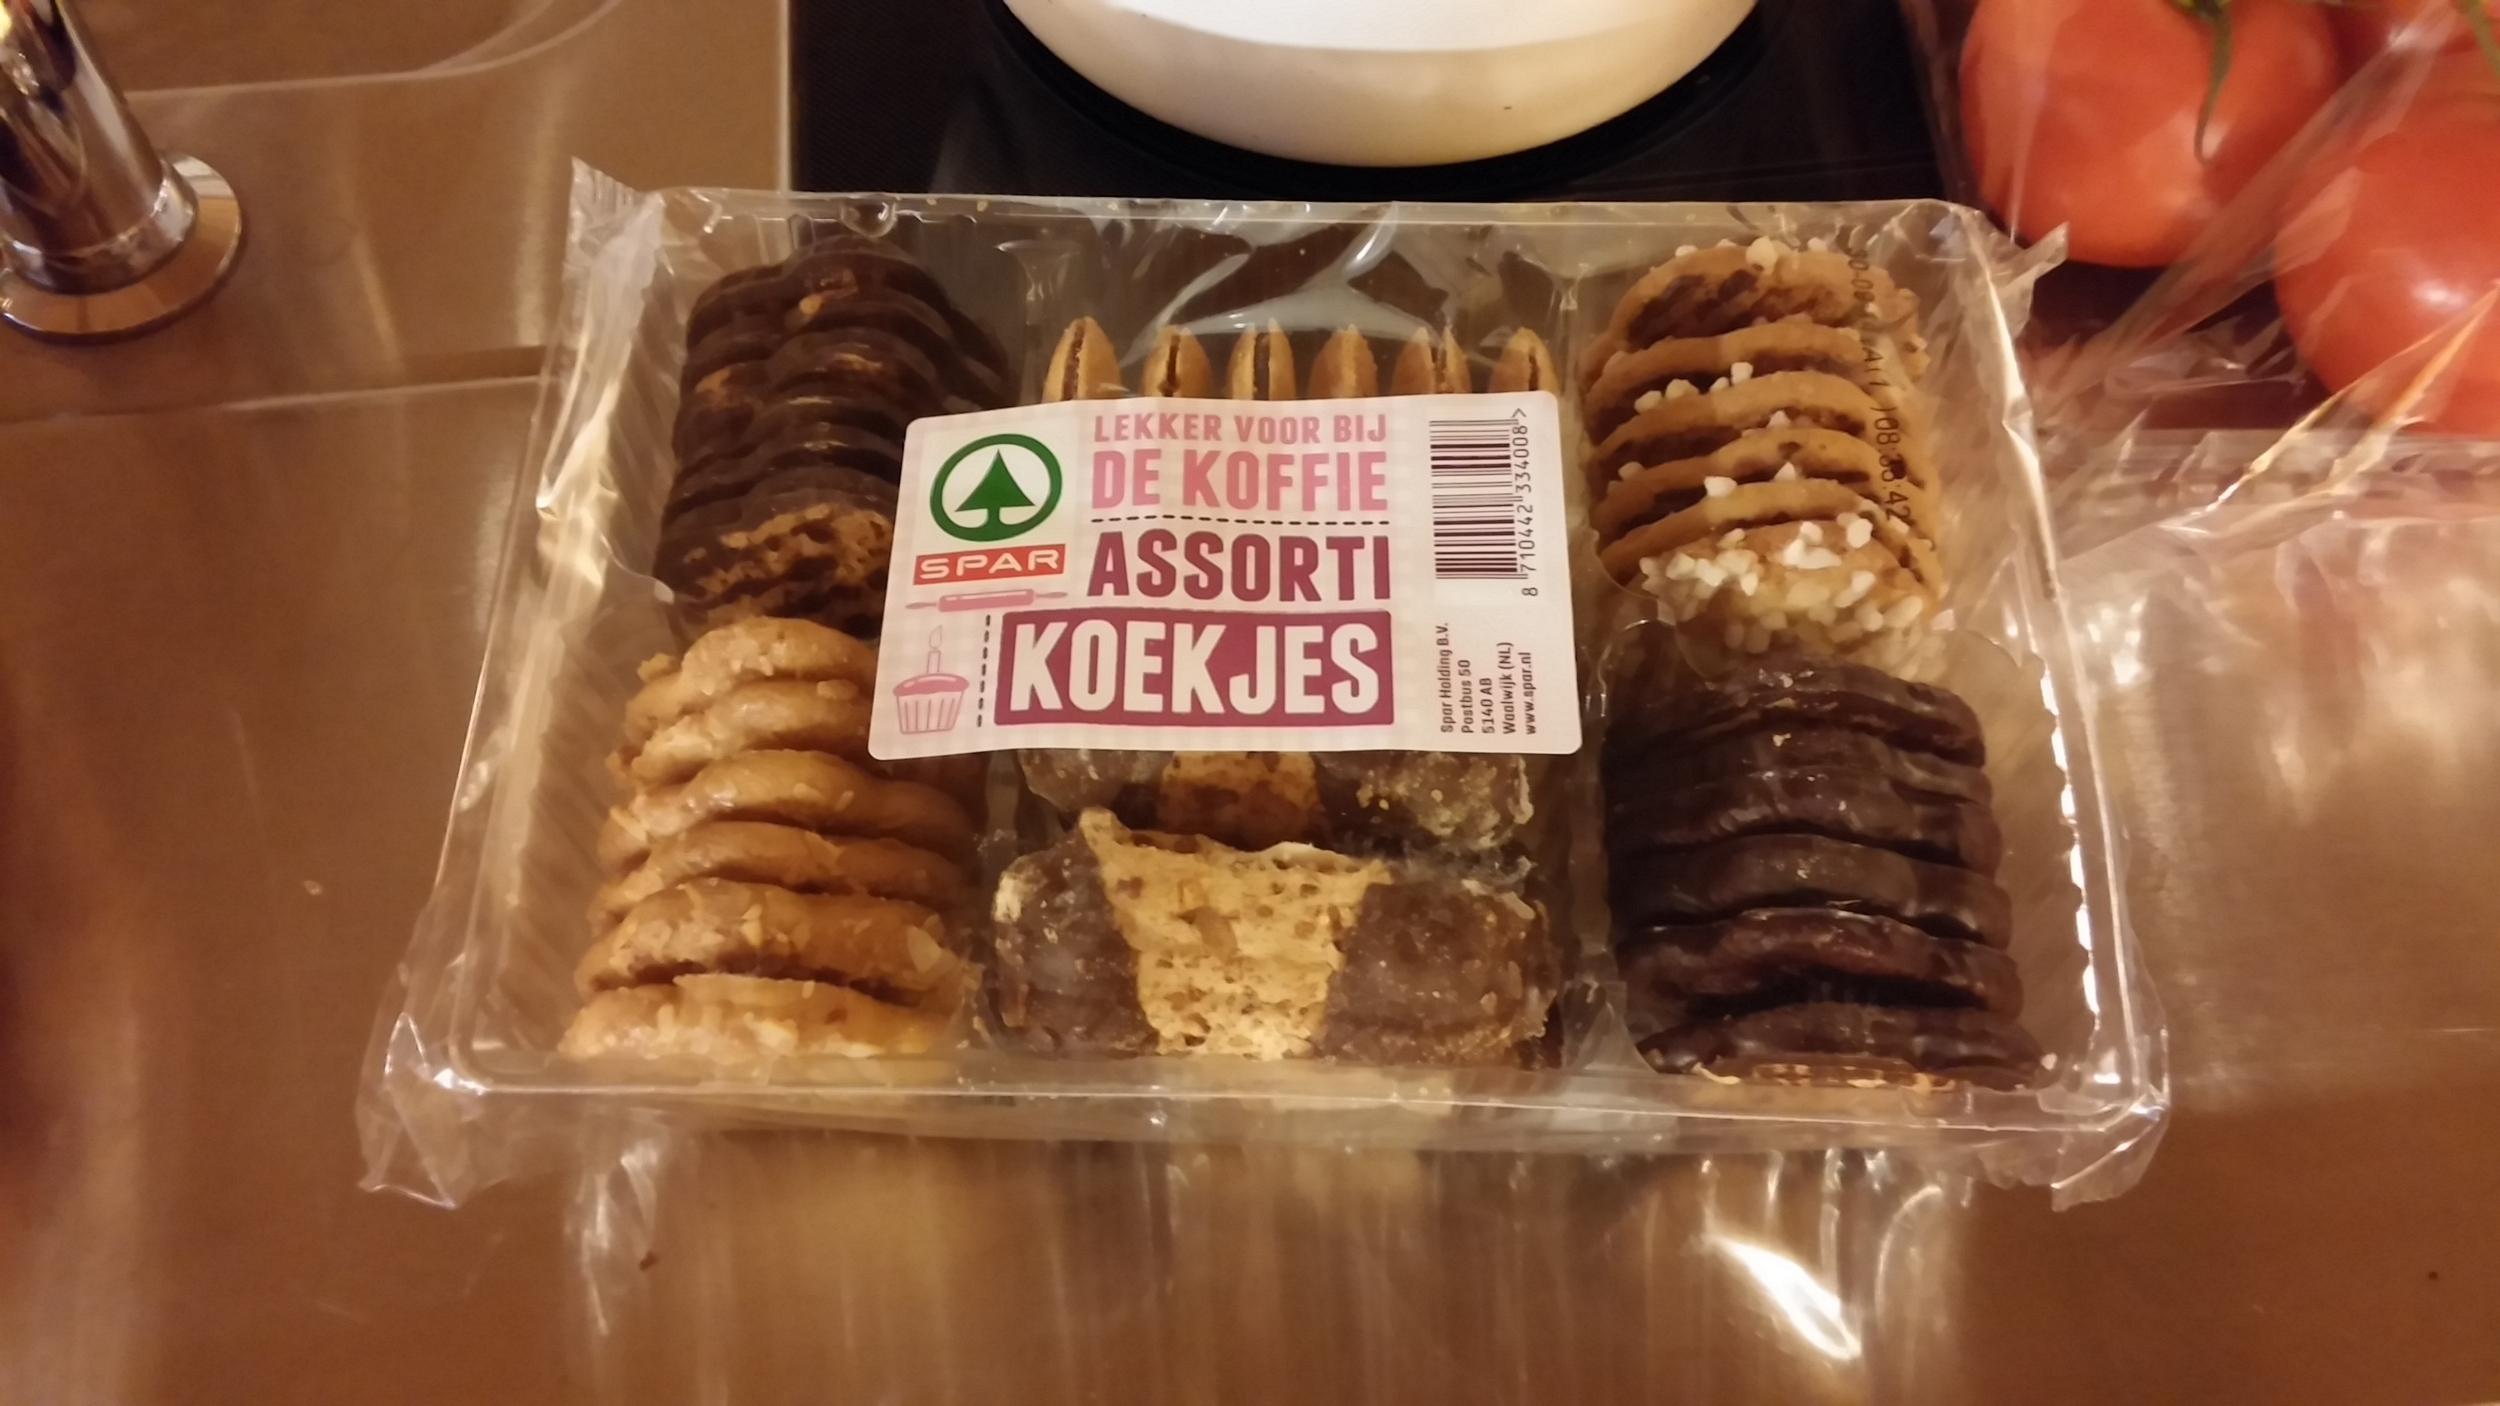 The last box of cookies.